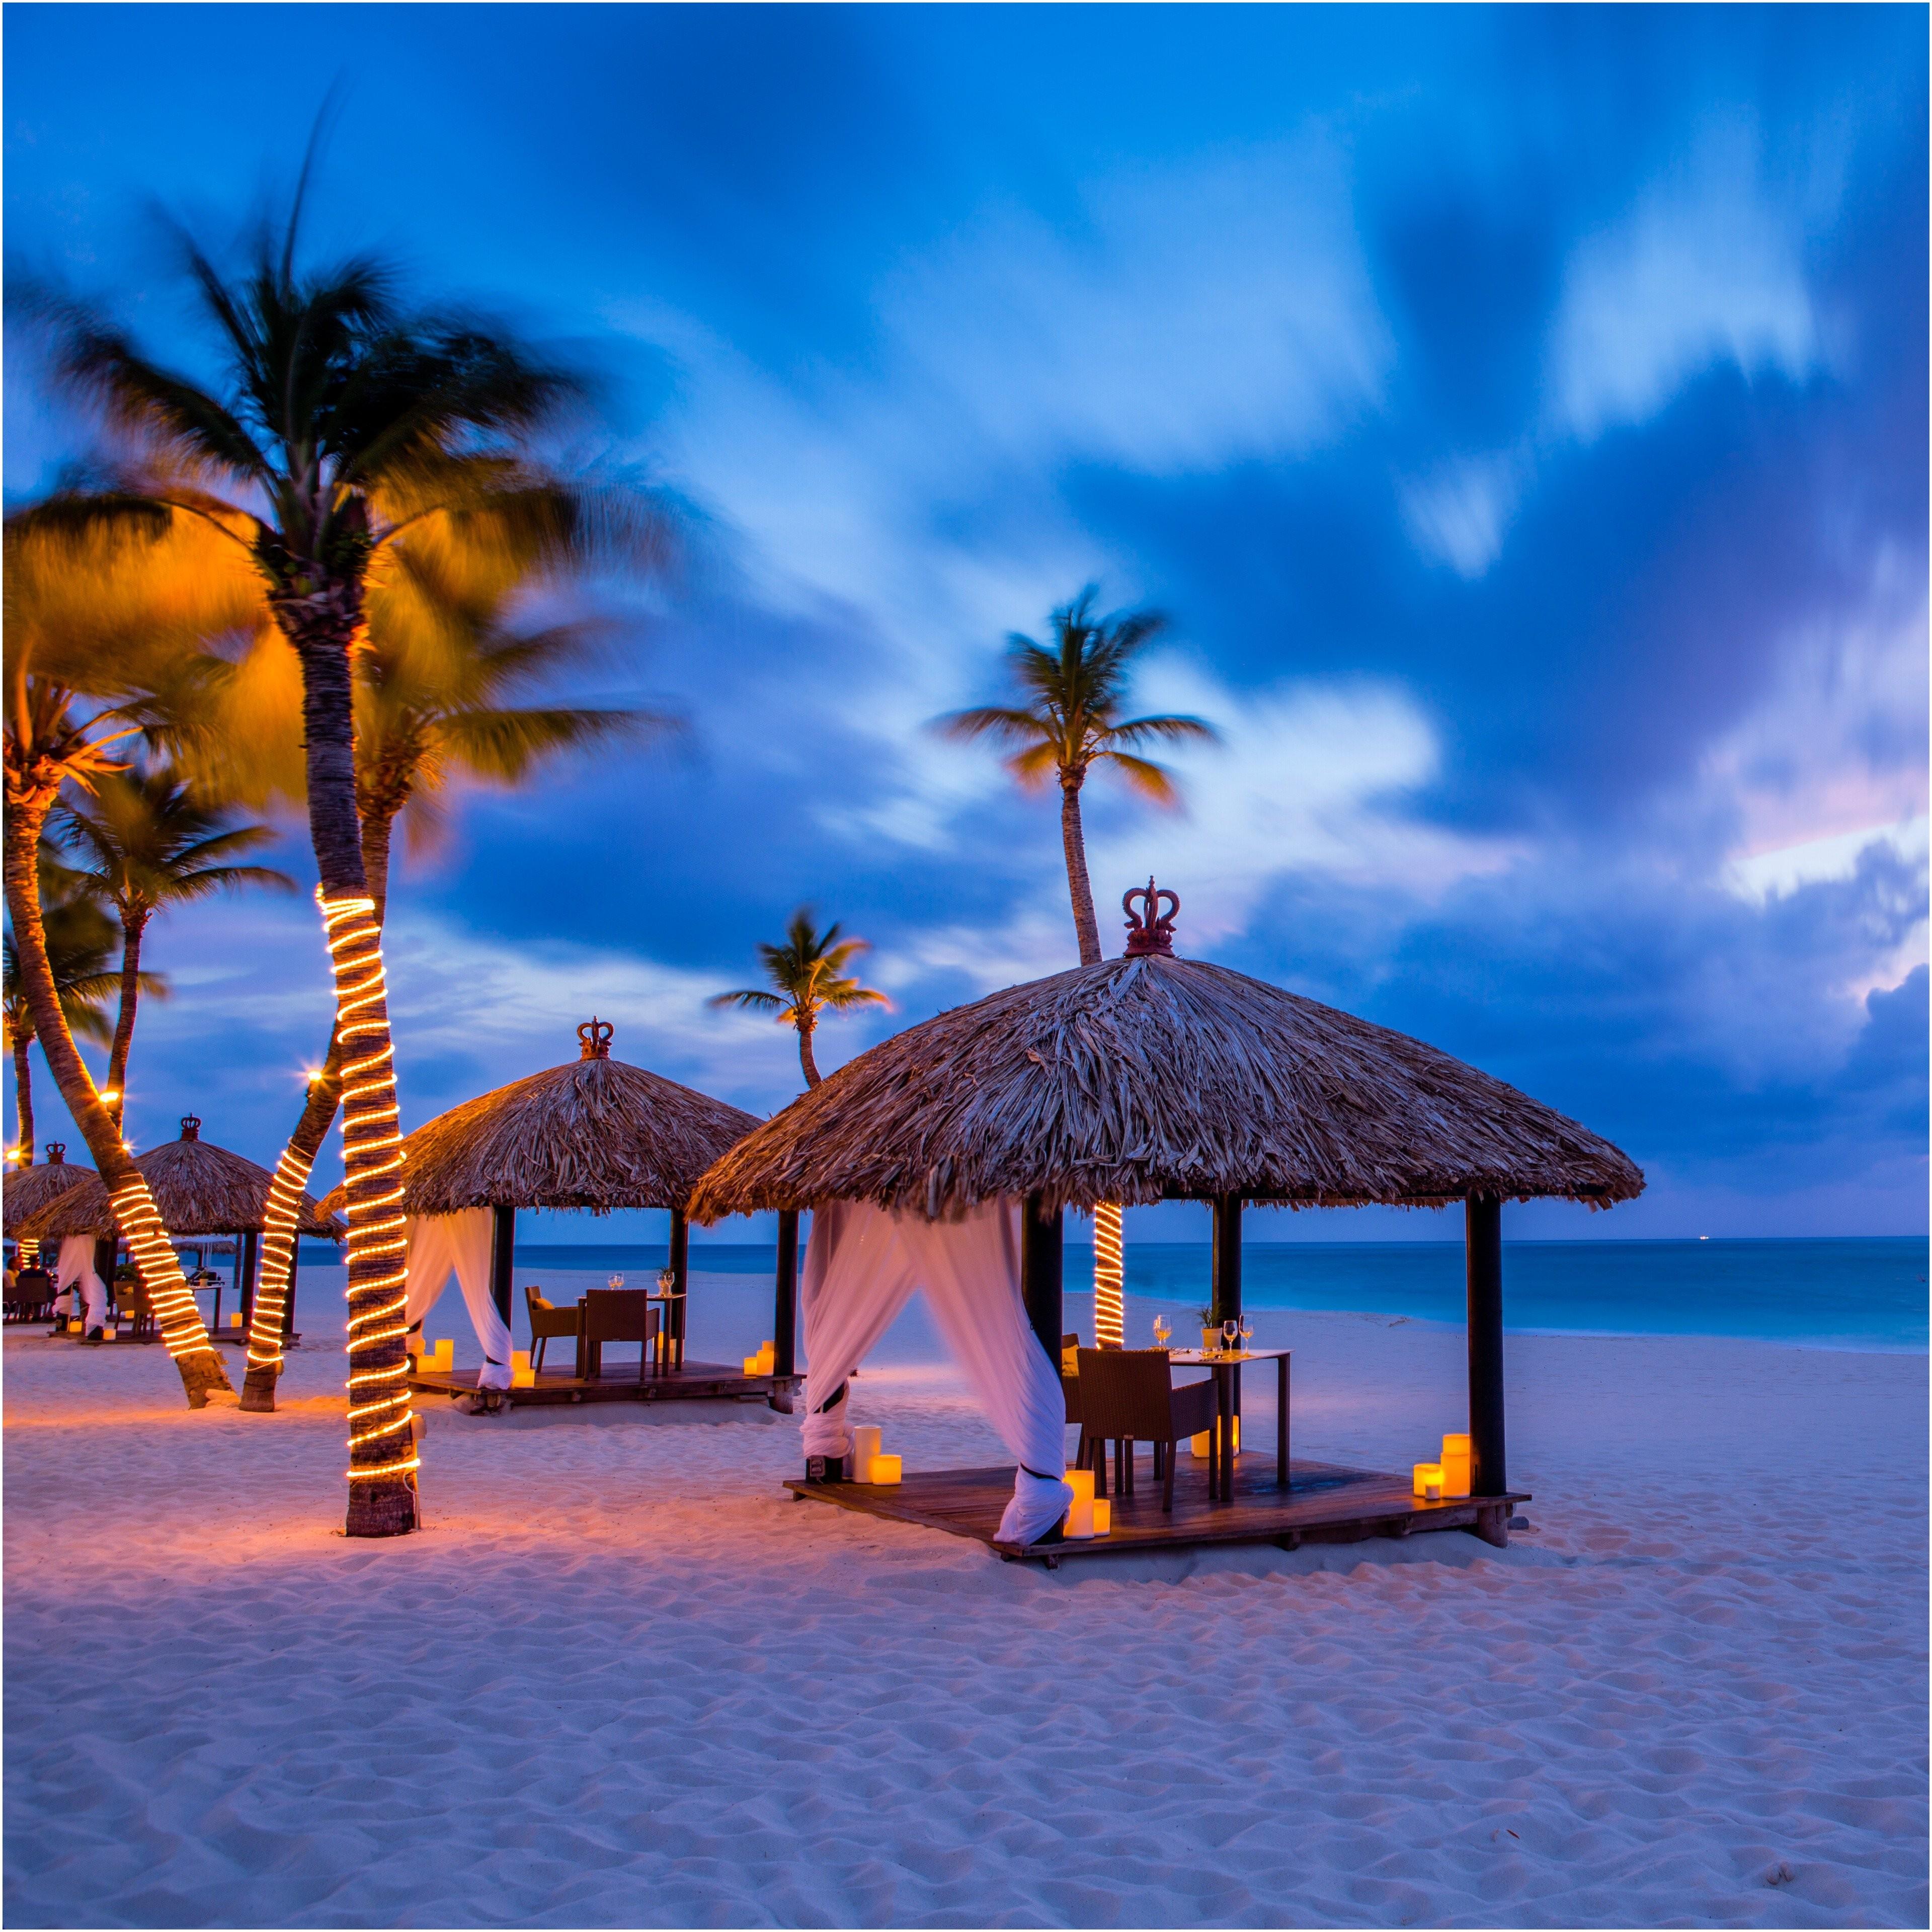 Best Italian Restaurants In Palm Beach Aruba Best Of Best Restaurants In Aruba top Rated Food Fine & Casual Dining